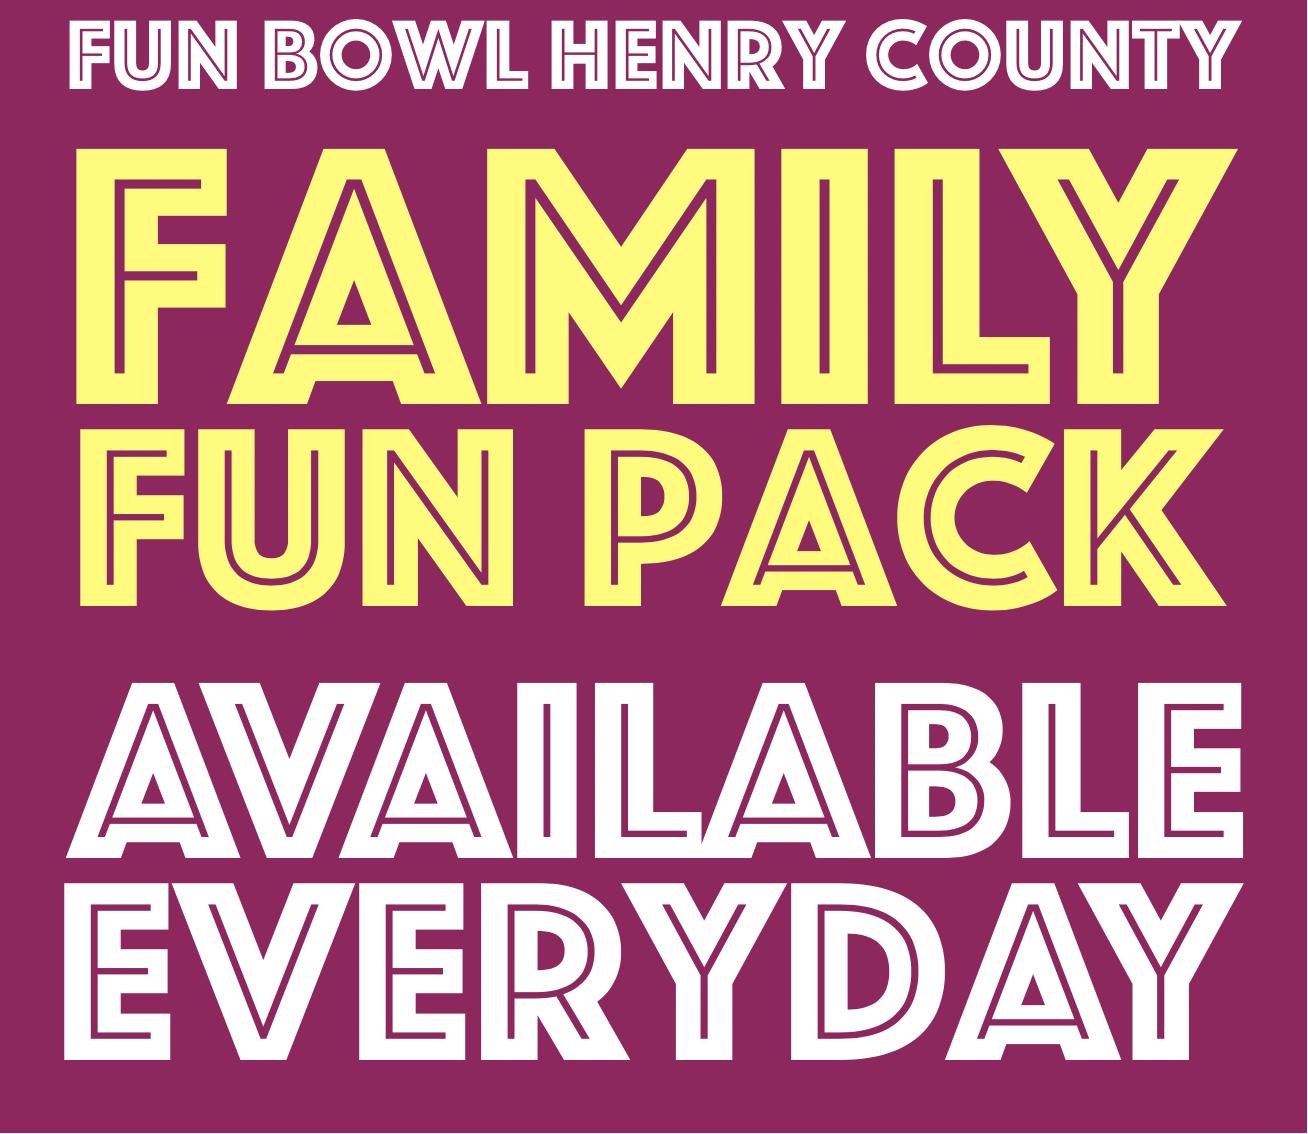 Fun Bowl Henry County Family Fun Pack Logo